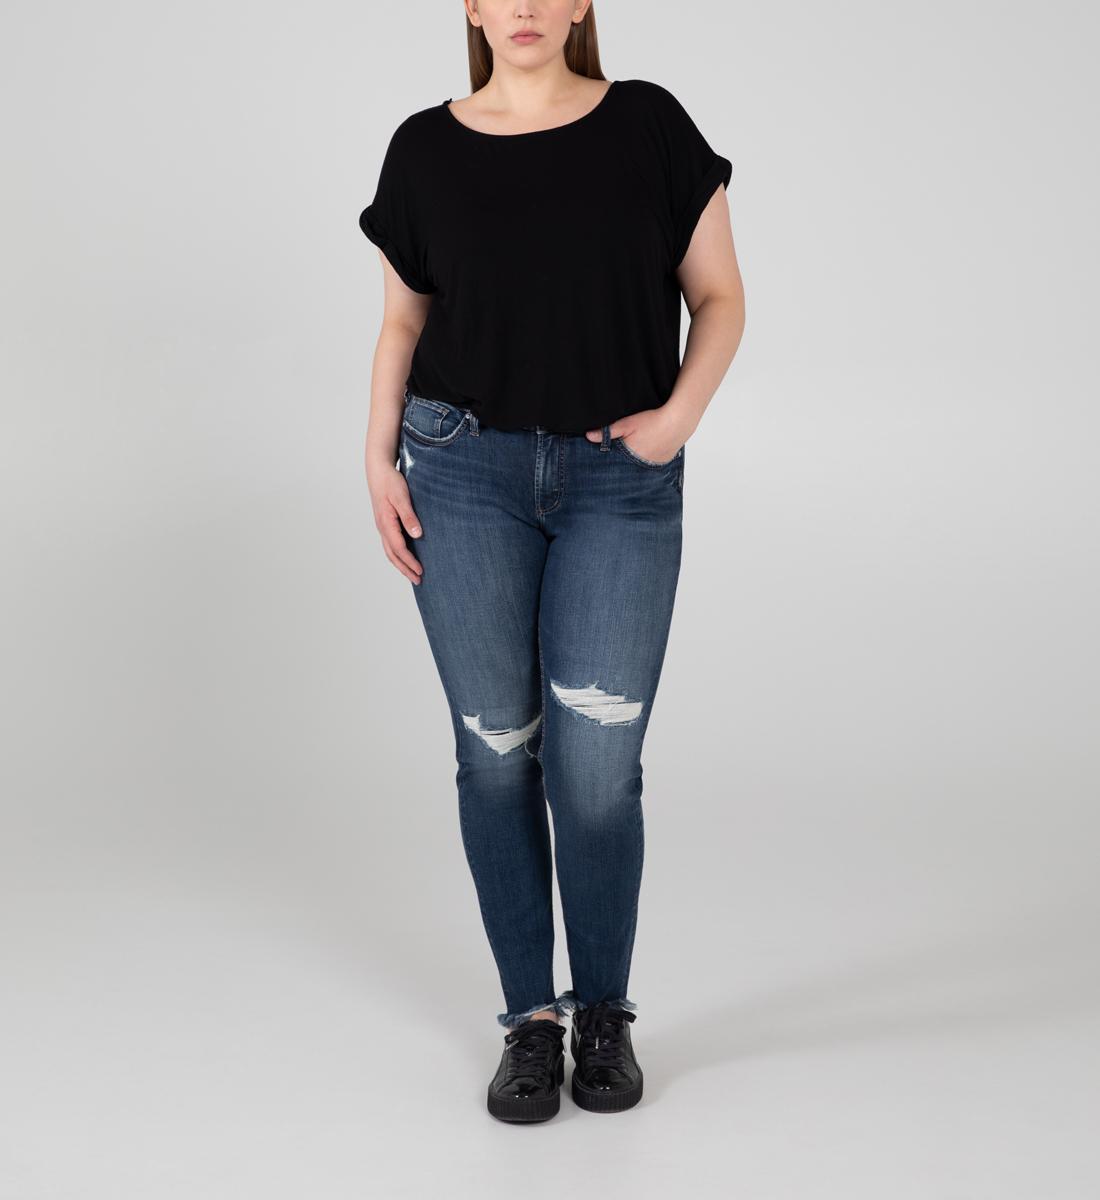 Silver Jeans Suki Mid Rise Skinny Jeans Plus Size